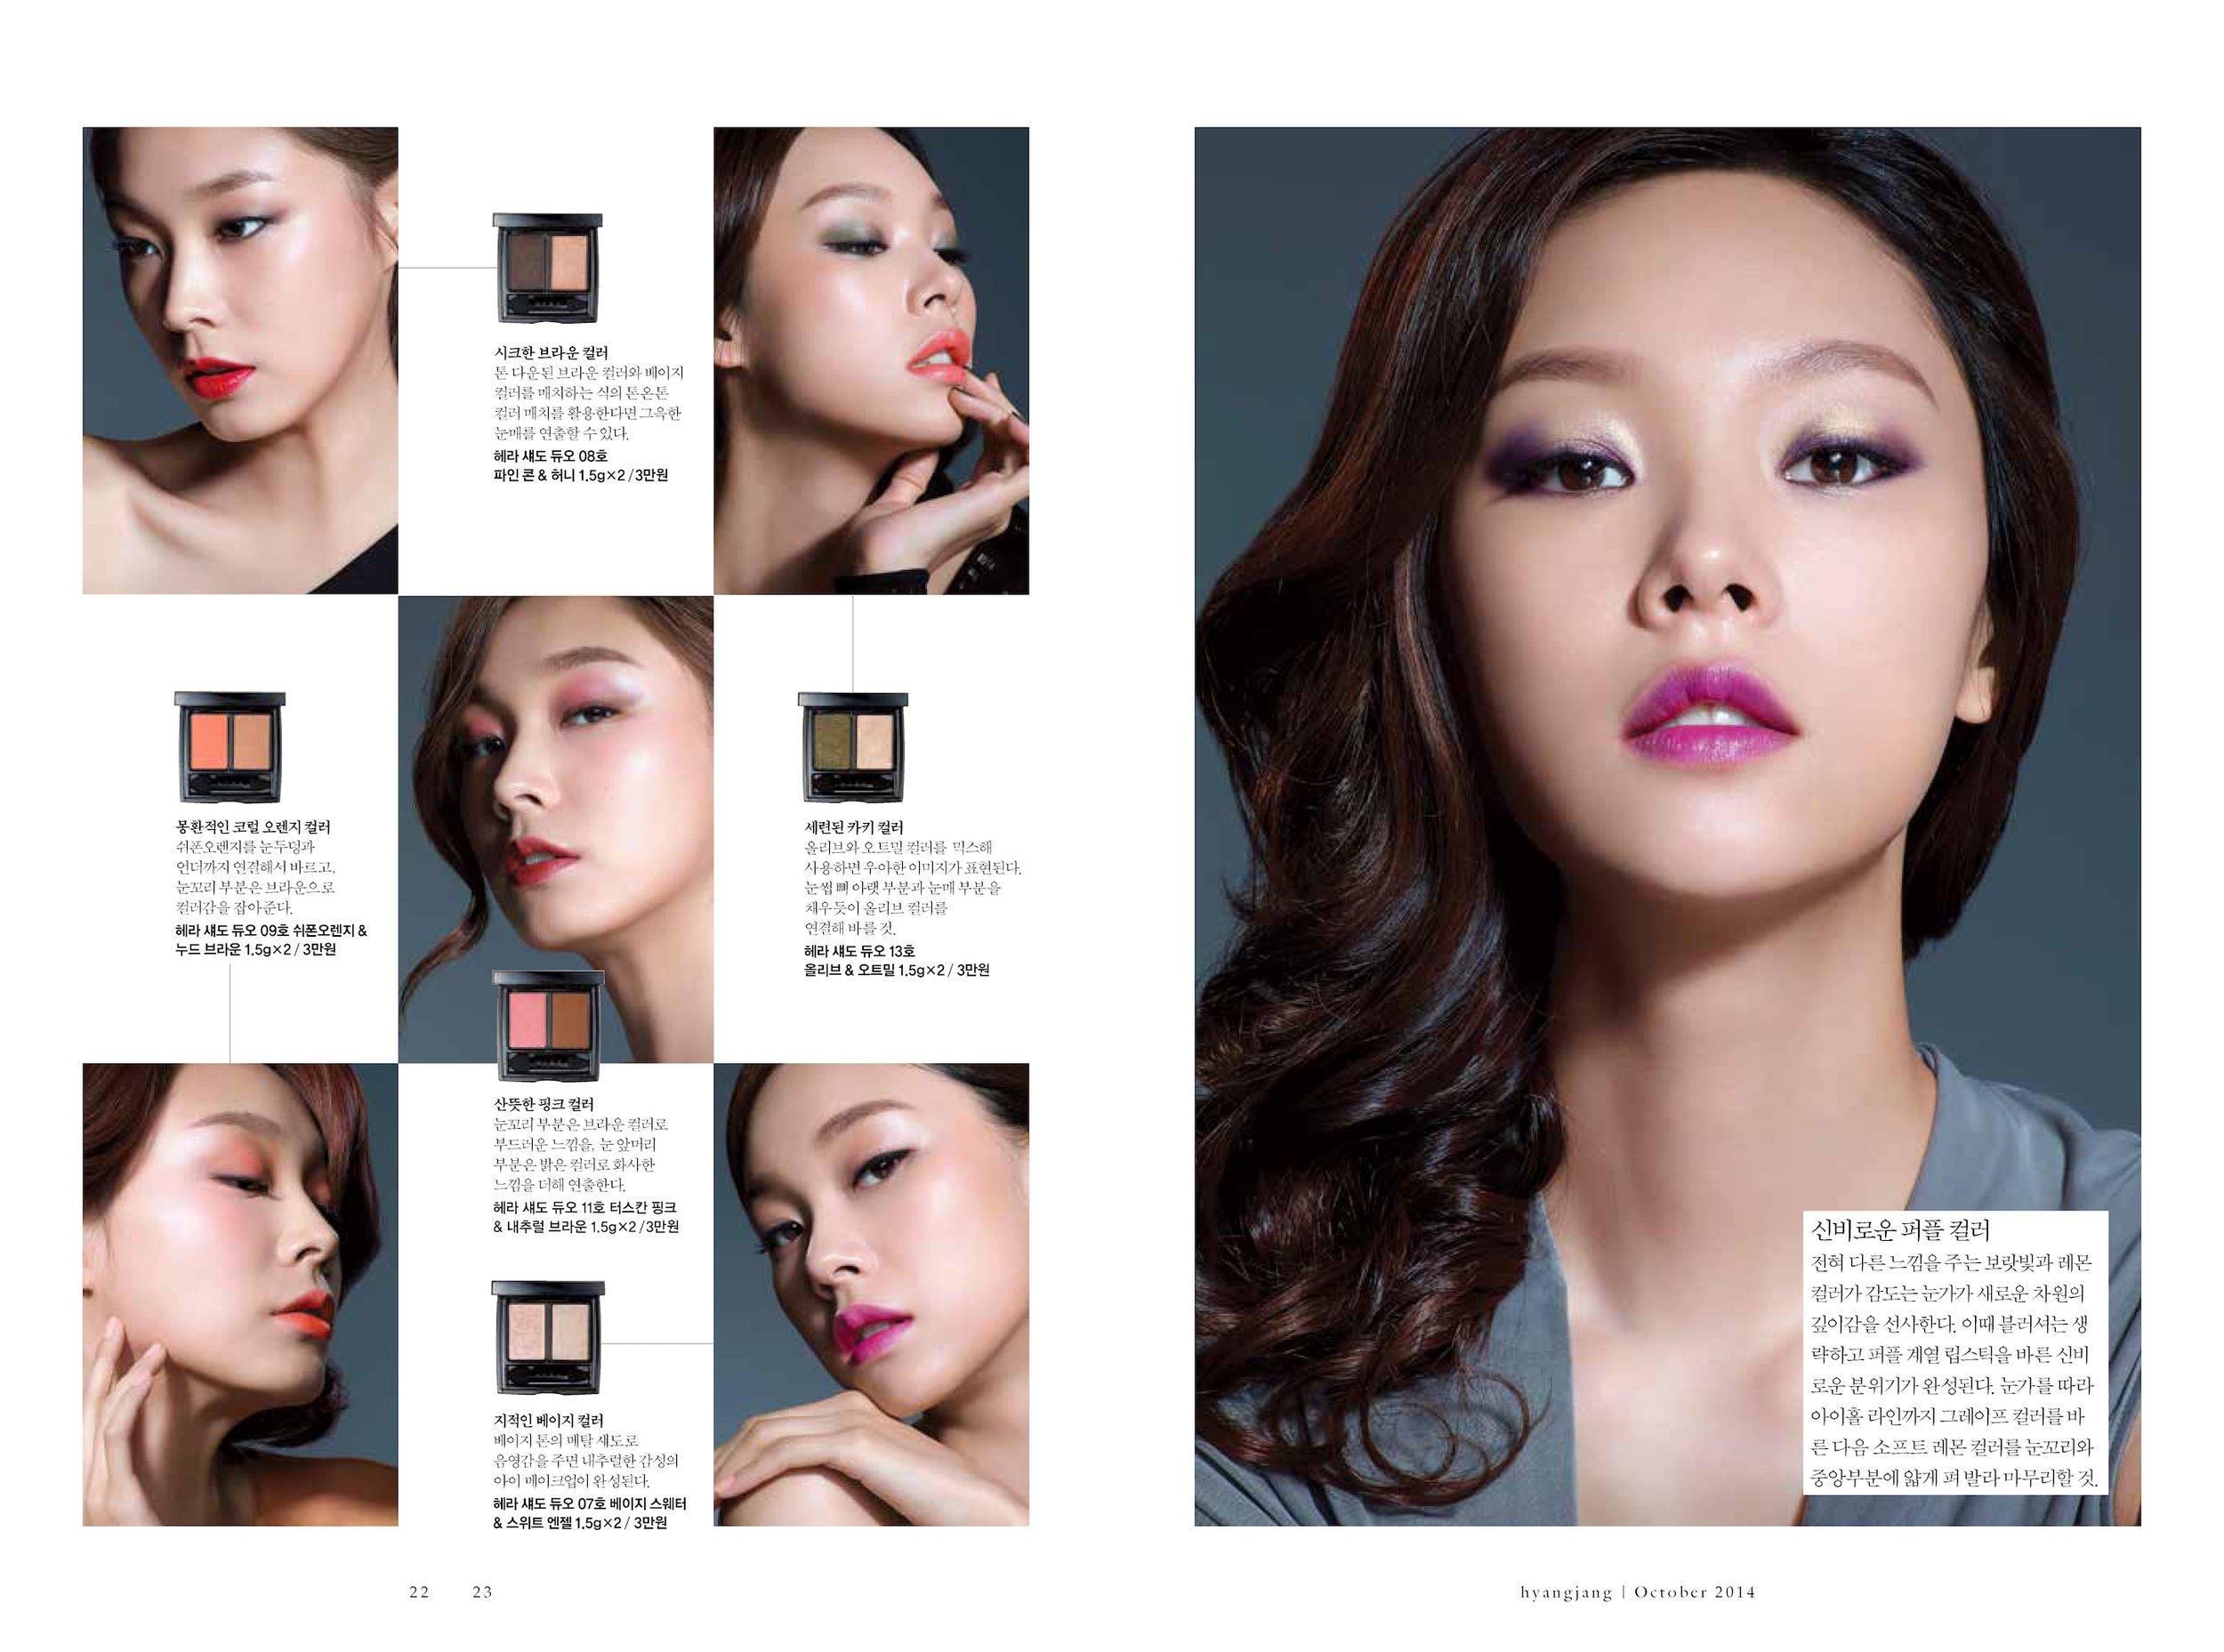 hyangjang-201410_페이지_12.jpeg